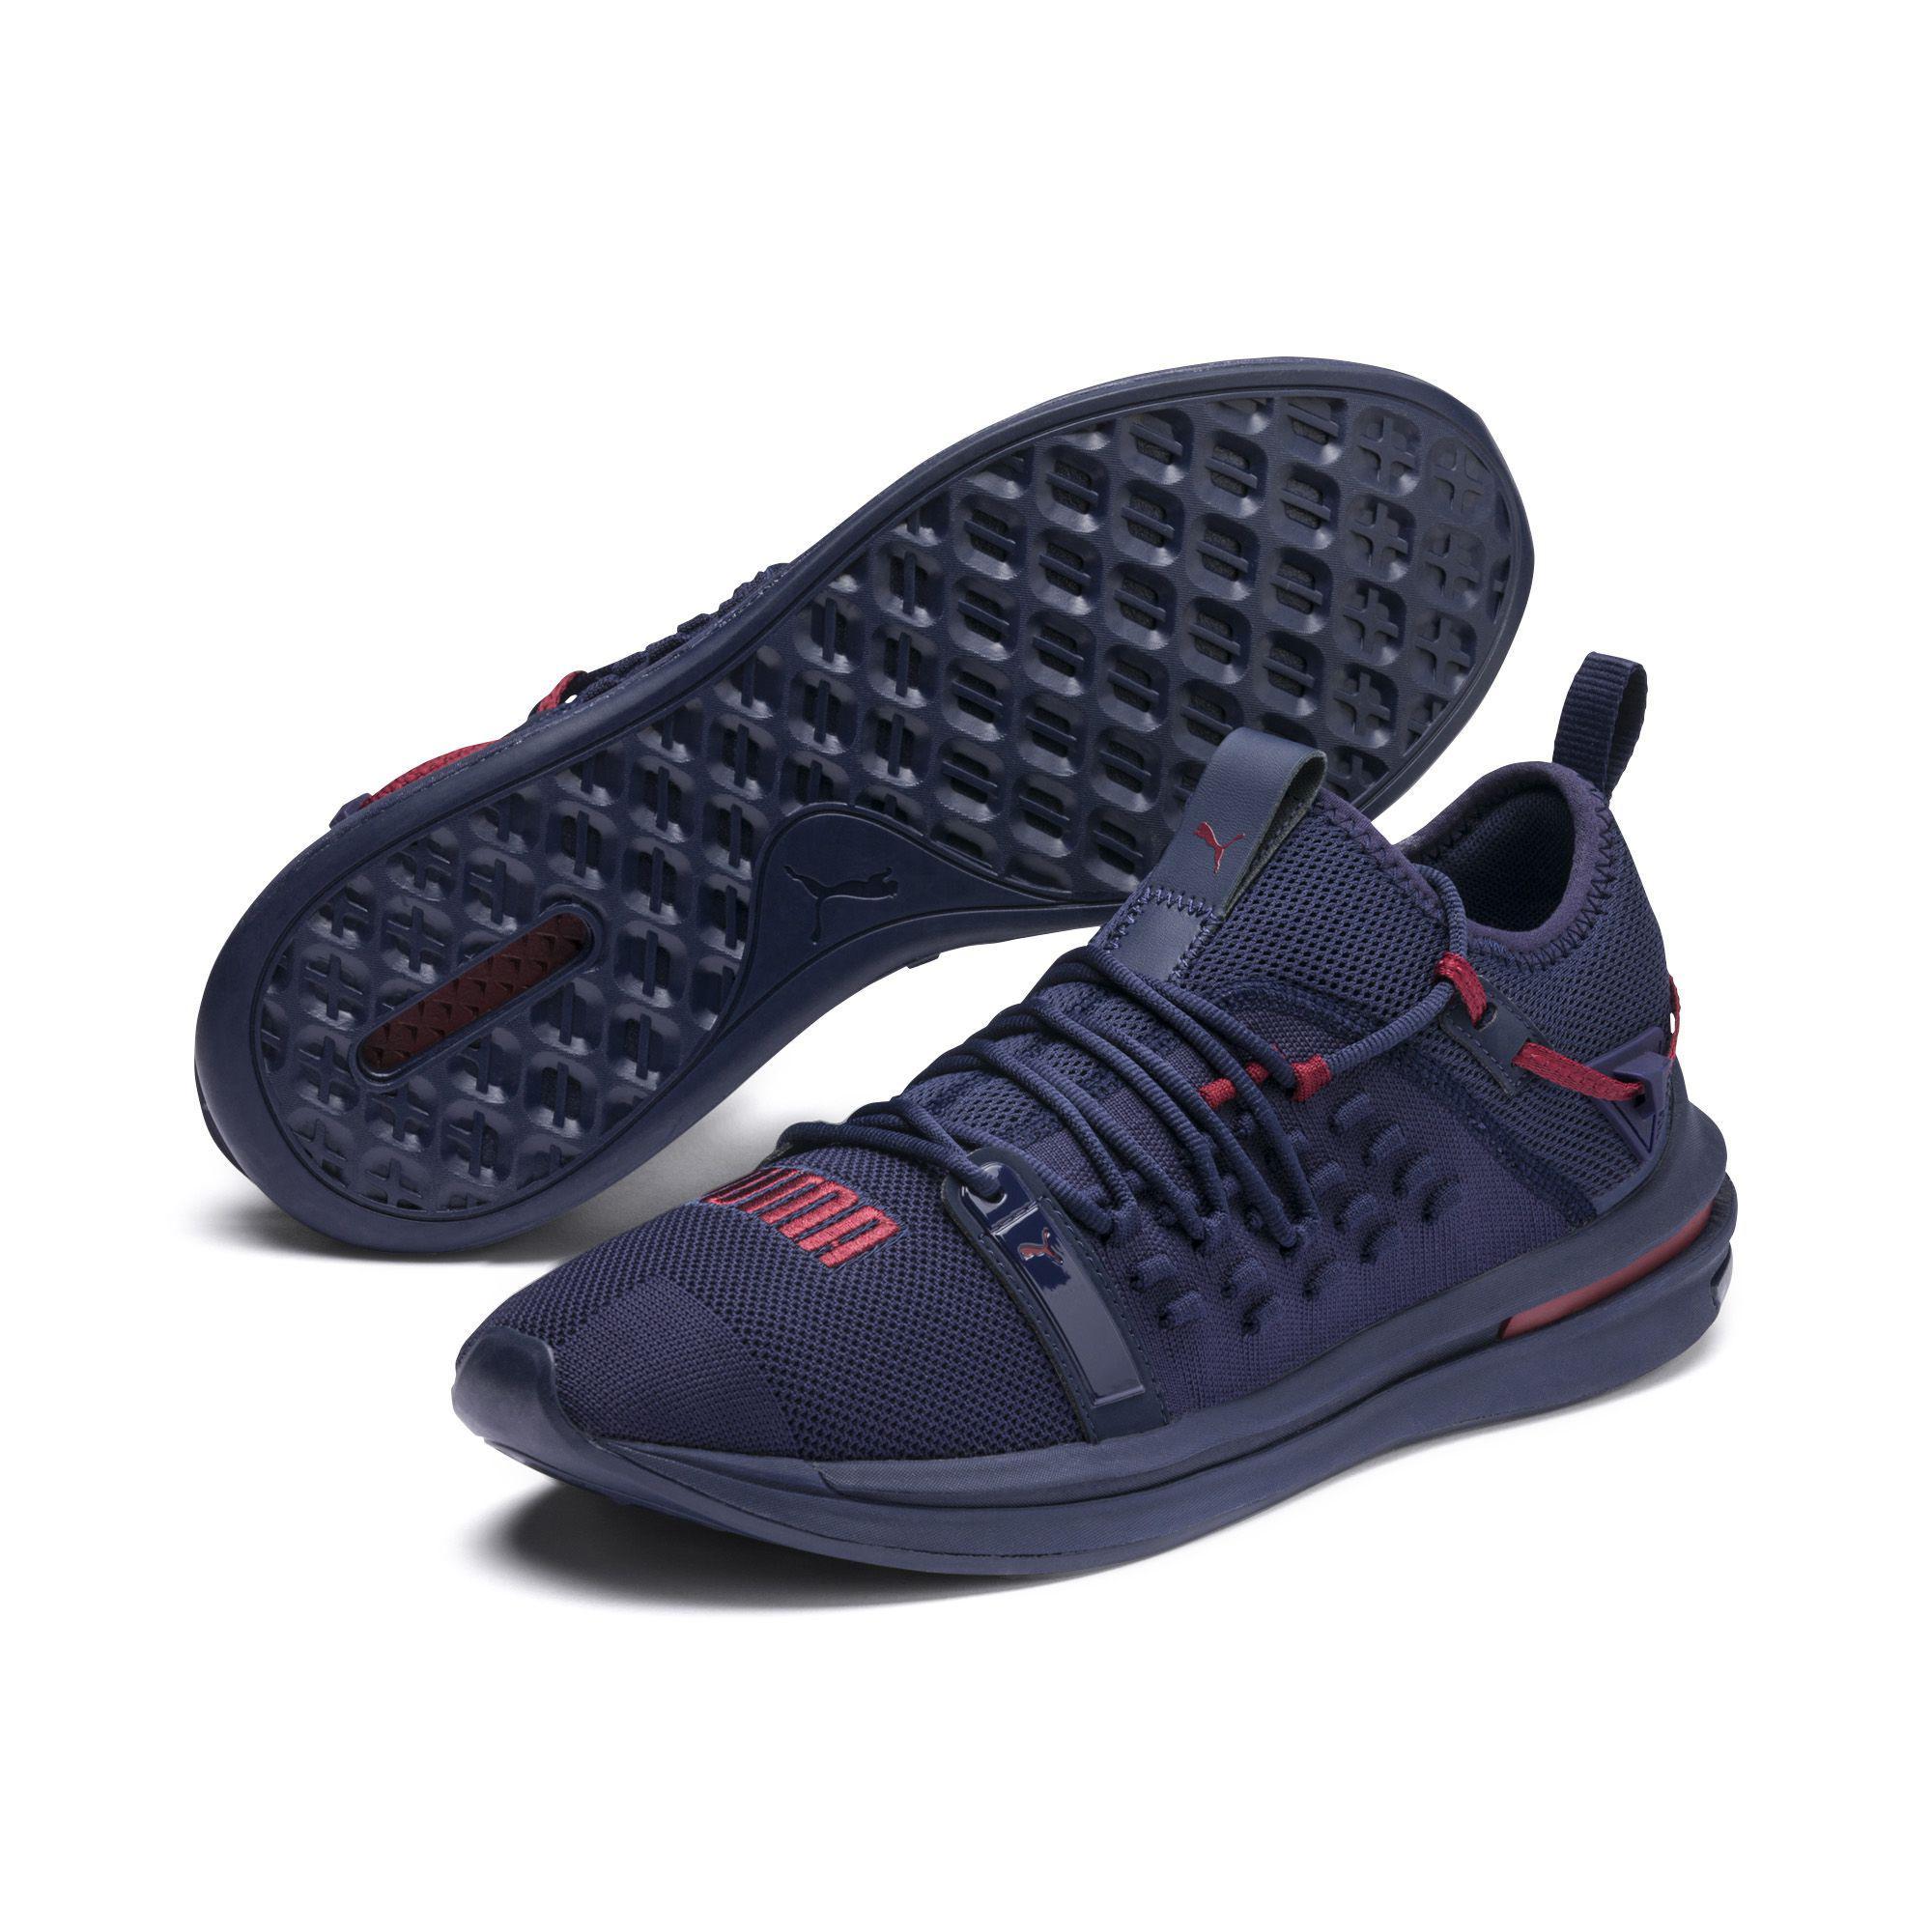 PUMA - Blue Ignite Limitless Sr Fusefit Running Shoes for Men - Lyst. View  fullscreen 36c121dae